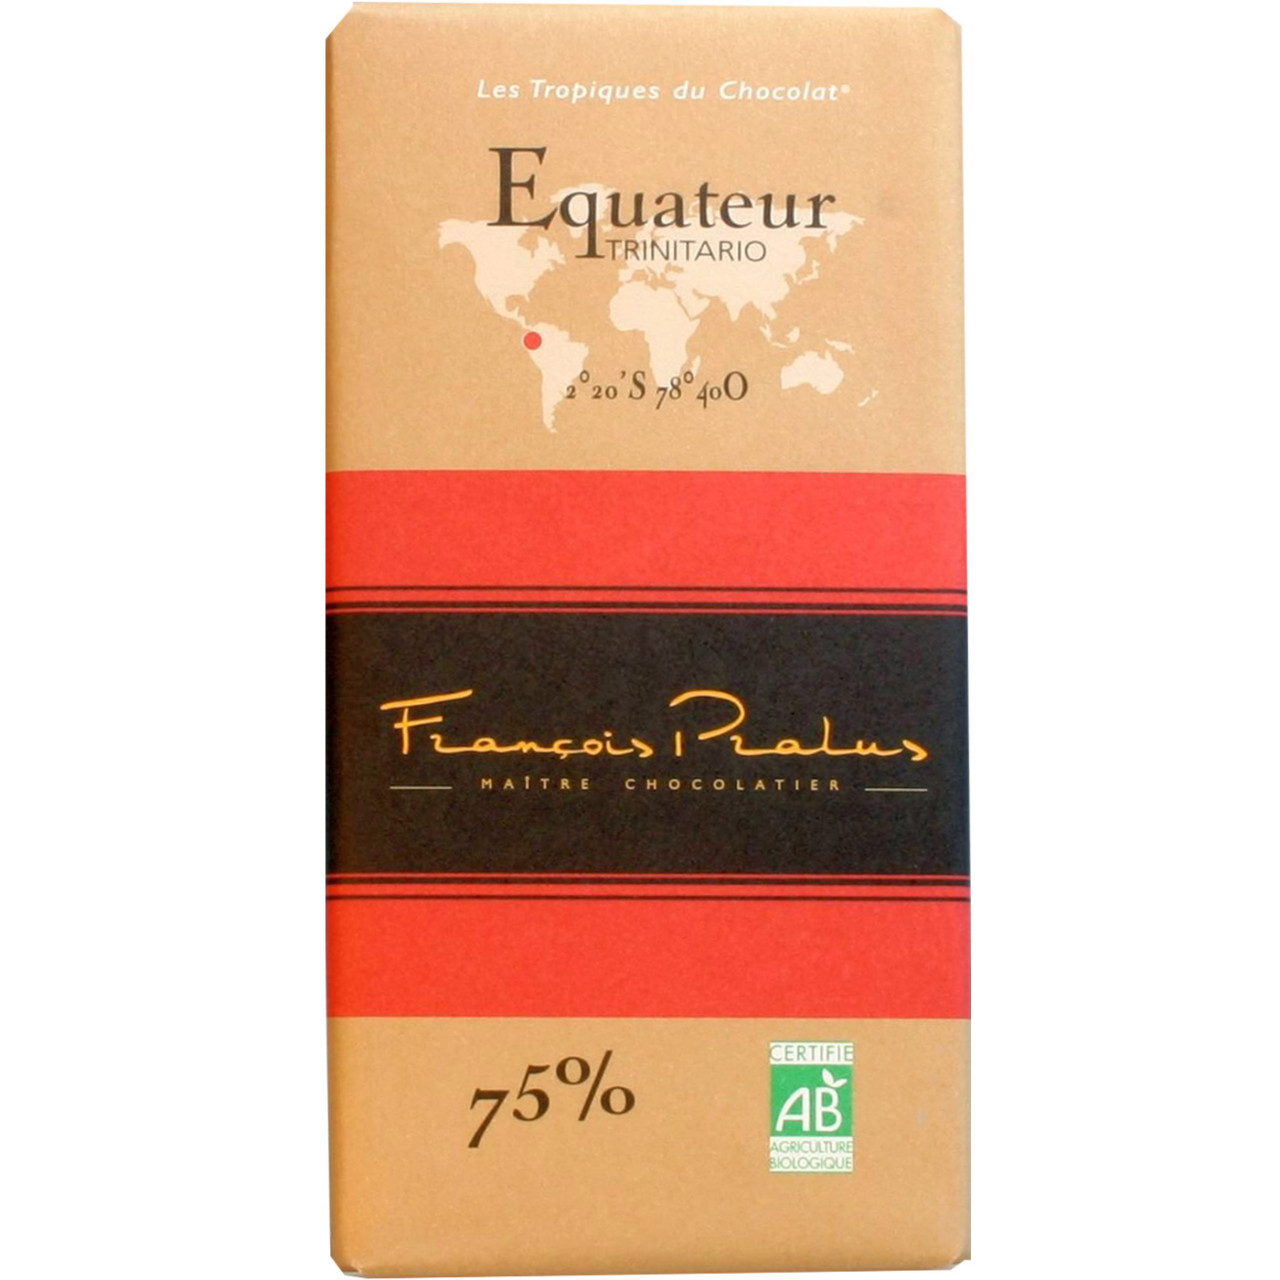 dunkle Schokolade 75%, Ecuador, Trinitario, dark chocolate, chocolat noir,